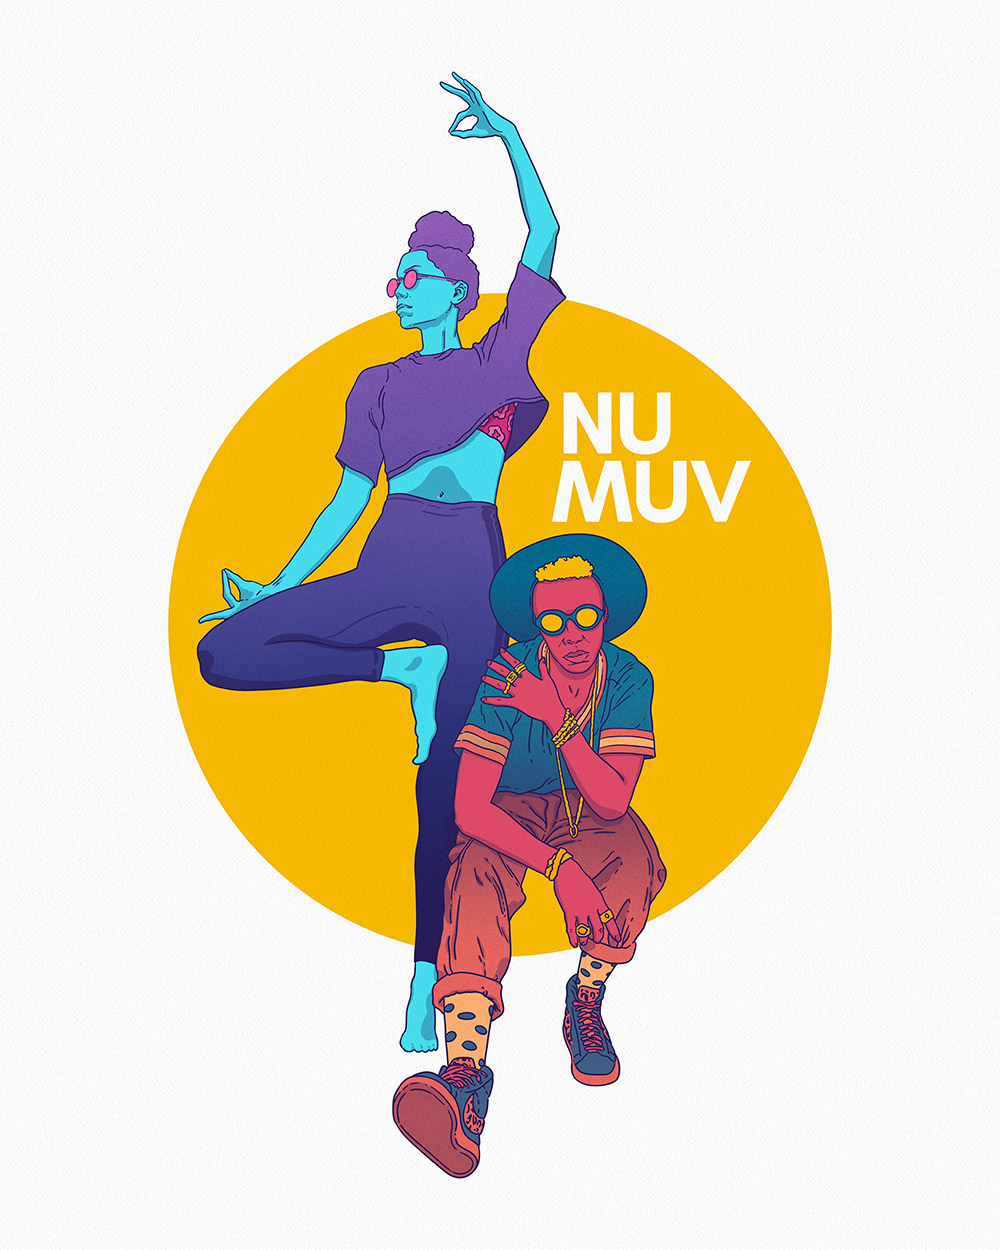 NU-MUV_PORTRAIT_yogA_YOGI_DJ_WEIJERRCHEN.jpg